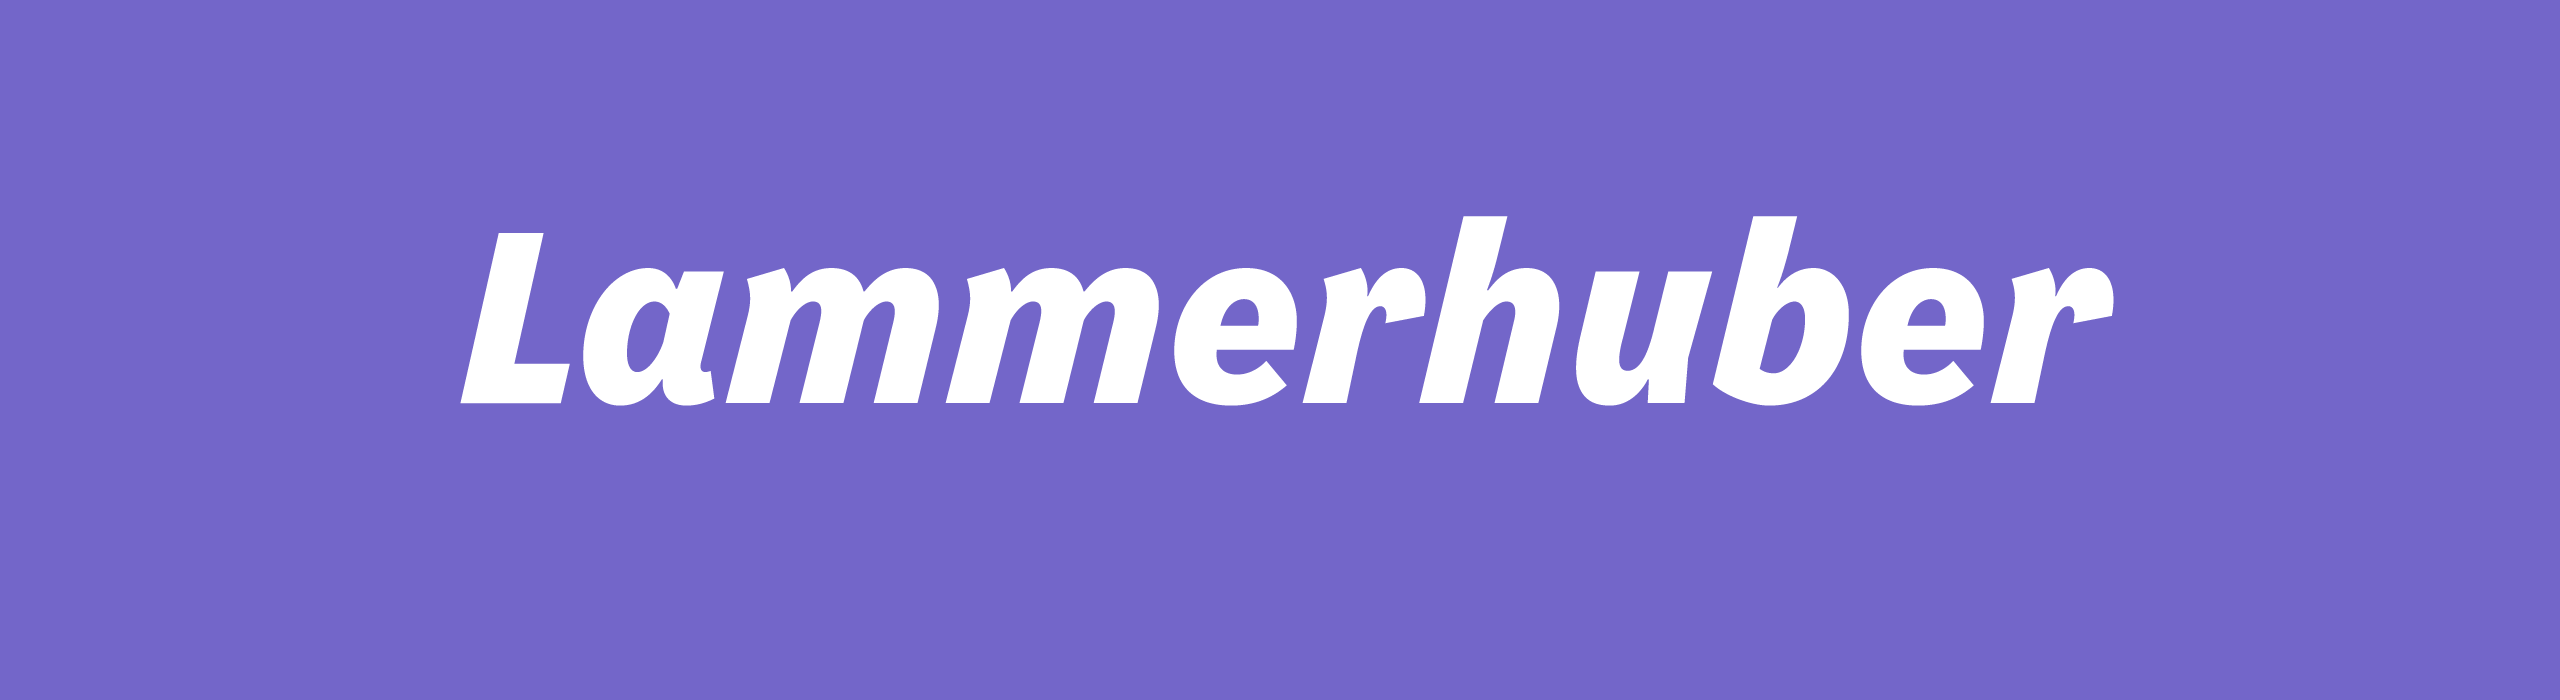 ITT_LammerhuberB